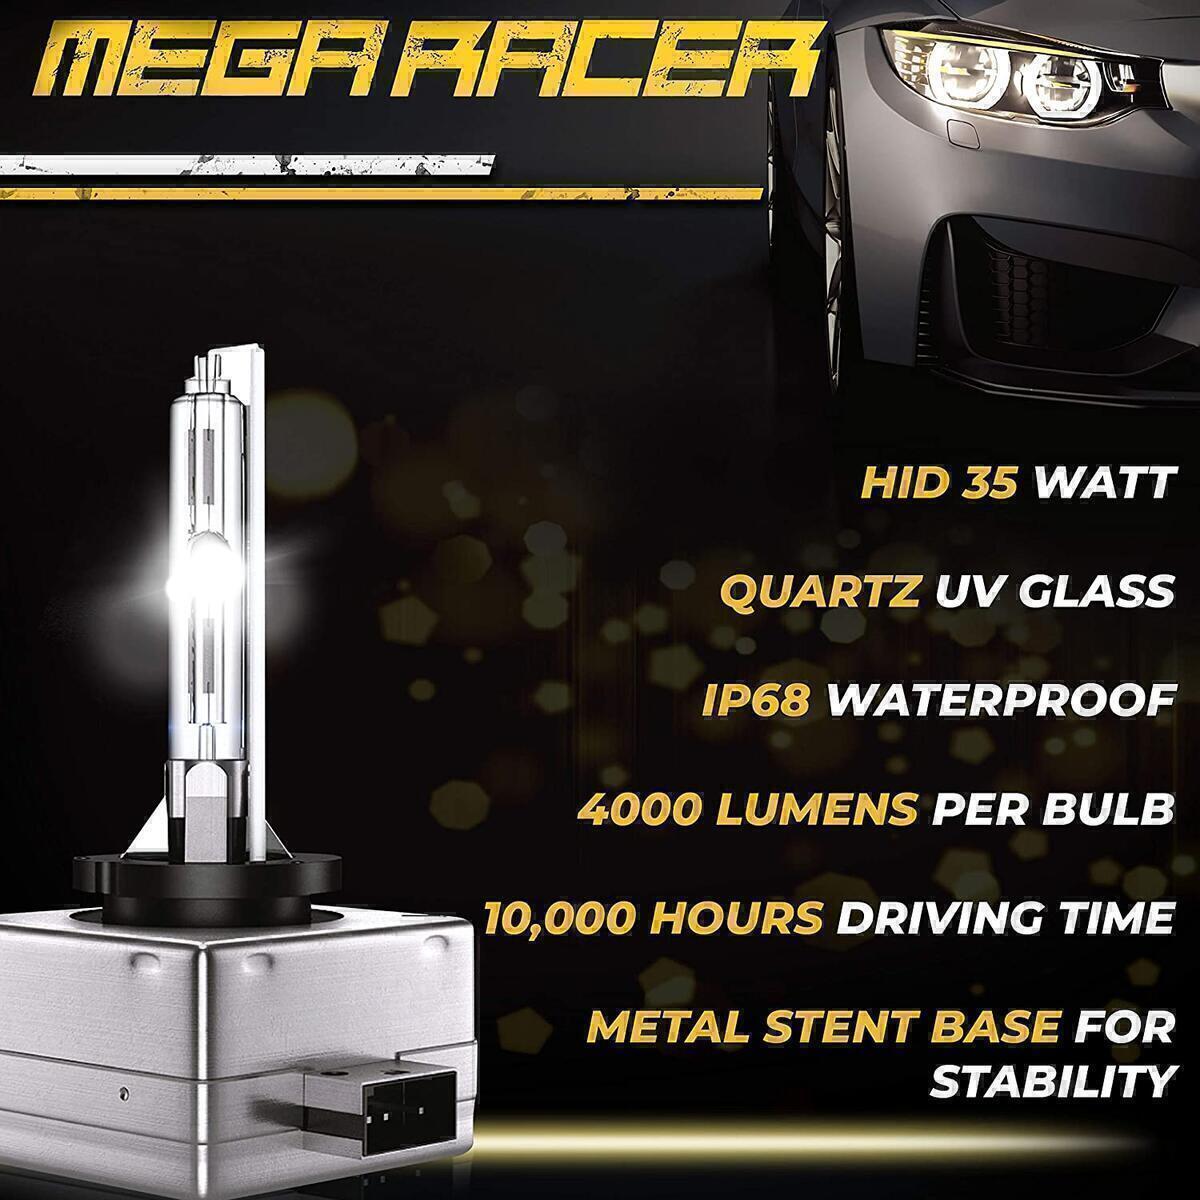 Mega Racer D3C/D3R/D3S HID Bulb Headlights for Low Beam High Beam 35W 8000K Ice Blue 8000 Lumens Xenon Headlights IP68 Waterproof, Pack of 2